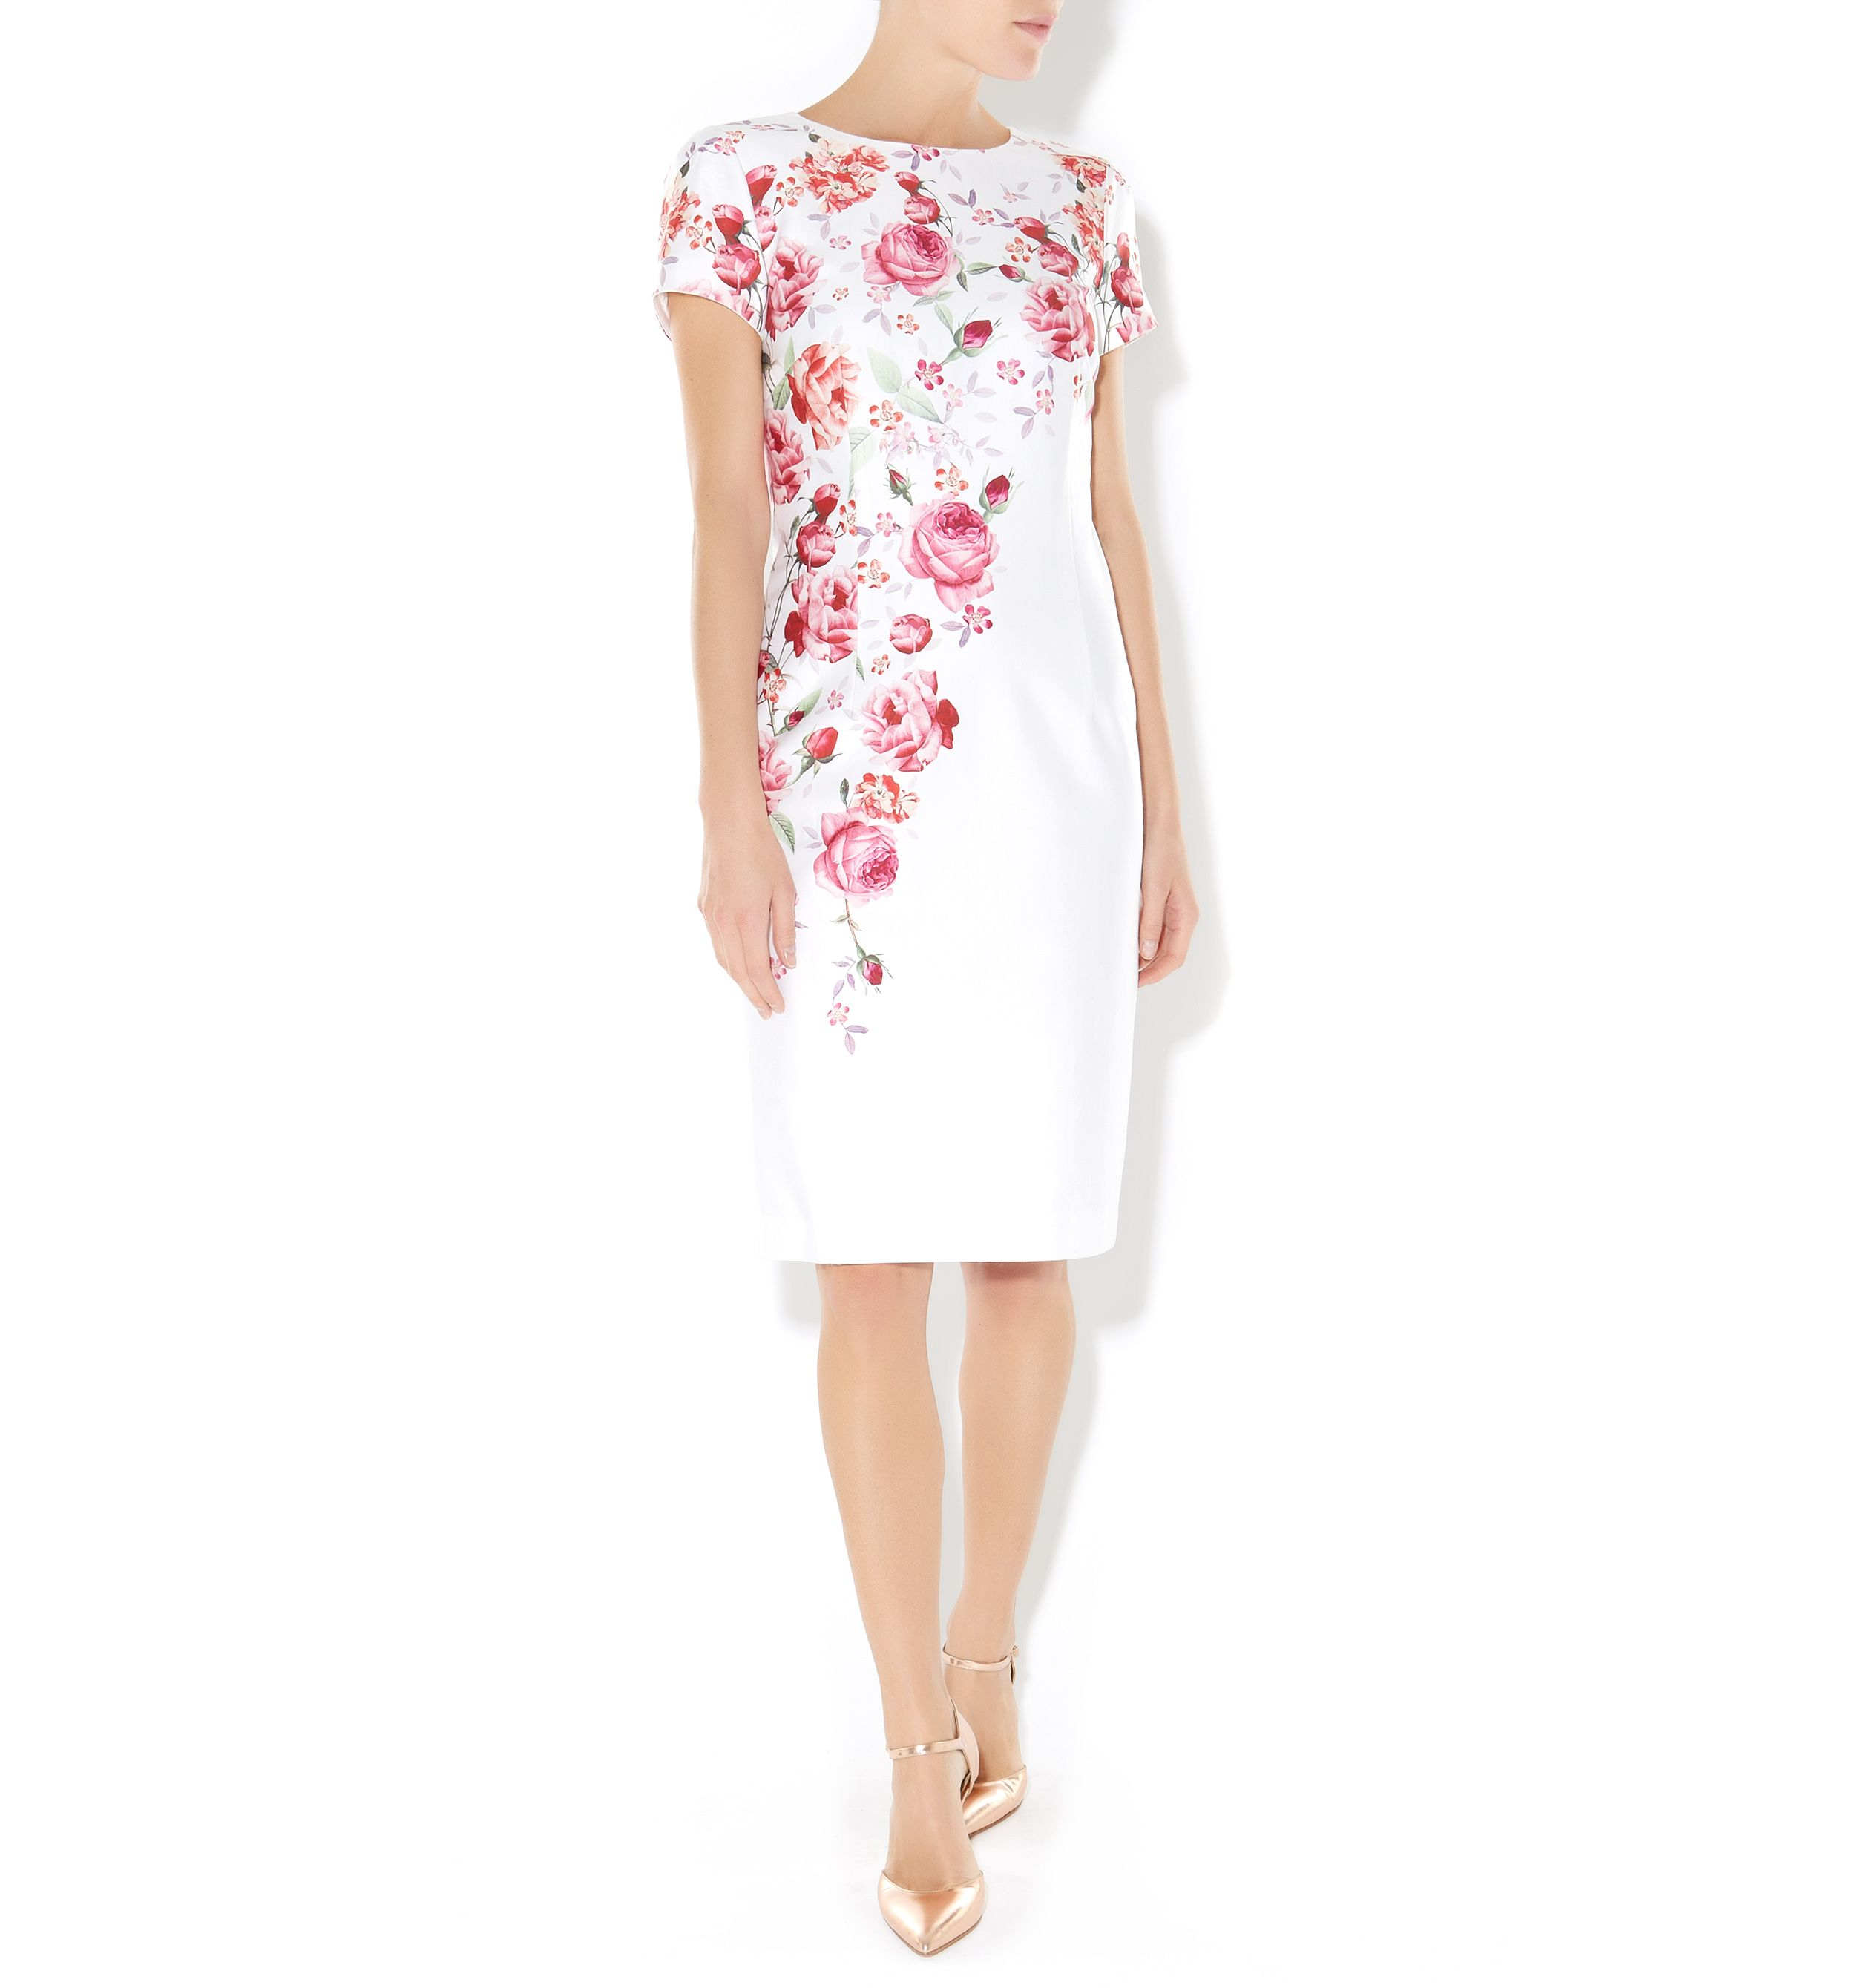 Attractive Hobbs Wedding Dress Pattern - Wedding Dress Ideas ...